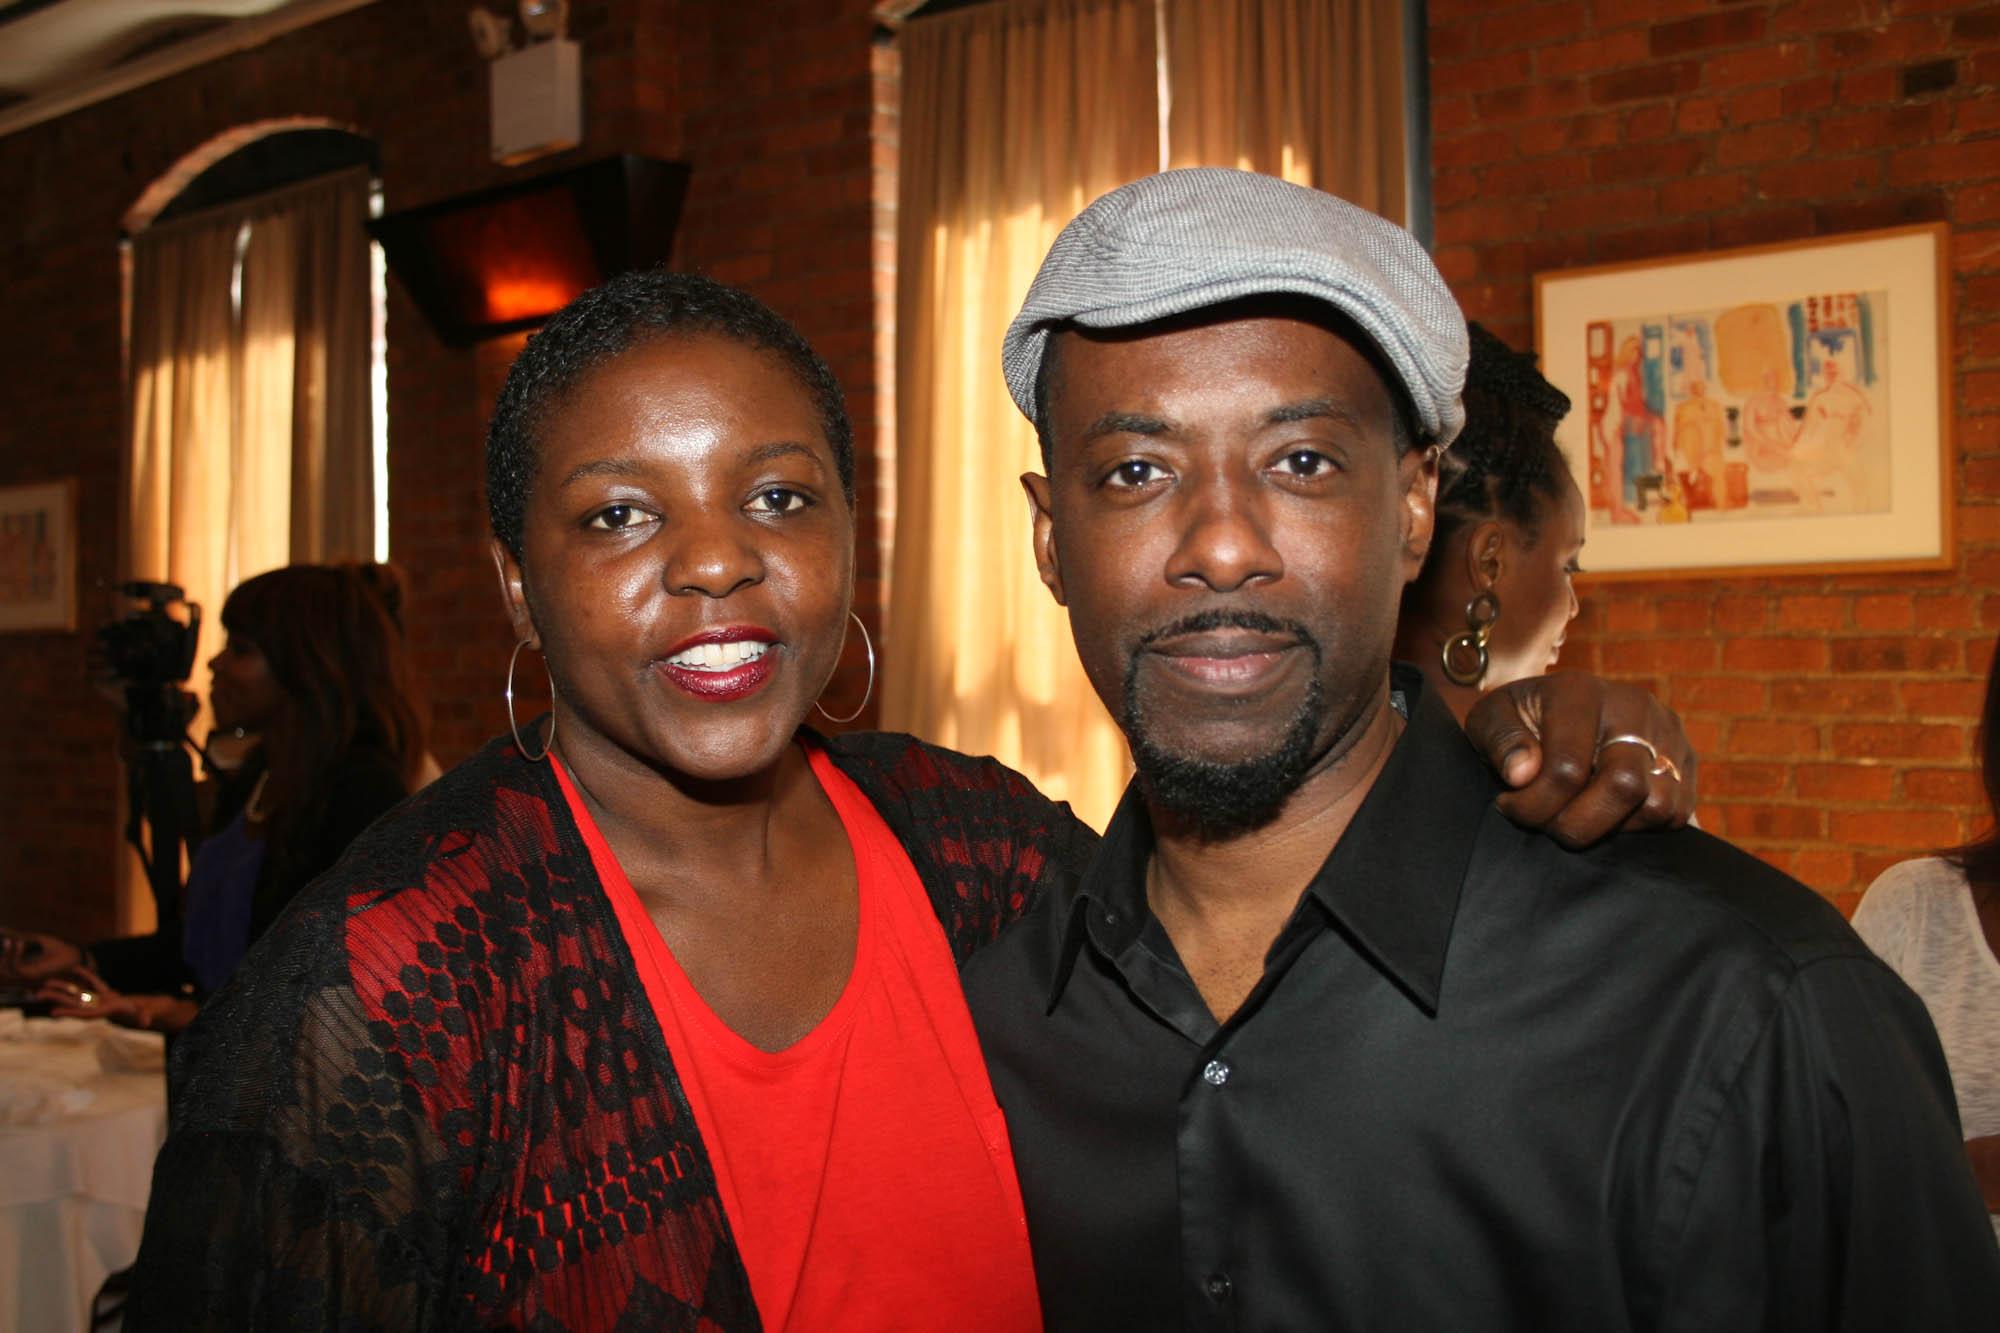 The New Black director Yoruba Richen and In Search of the Black Knight